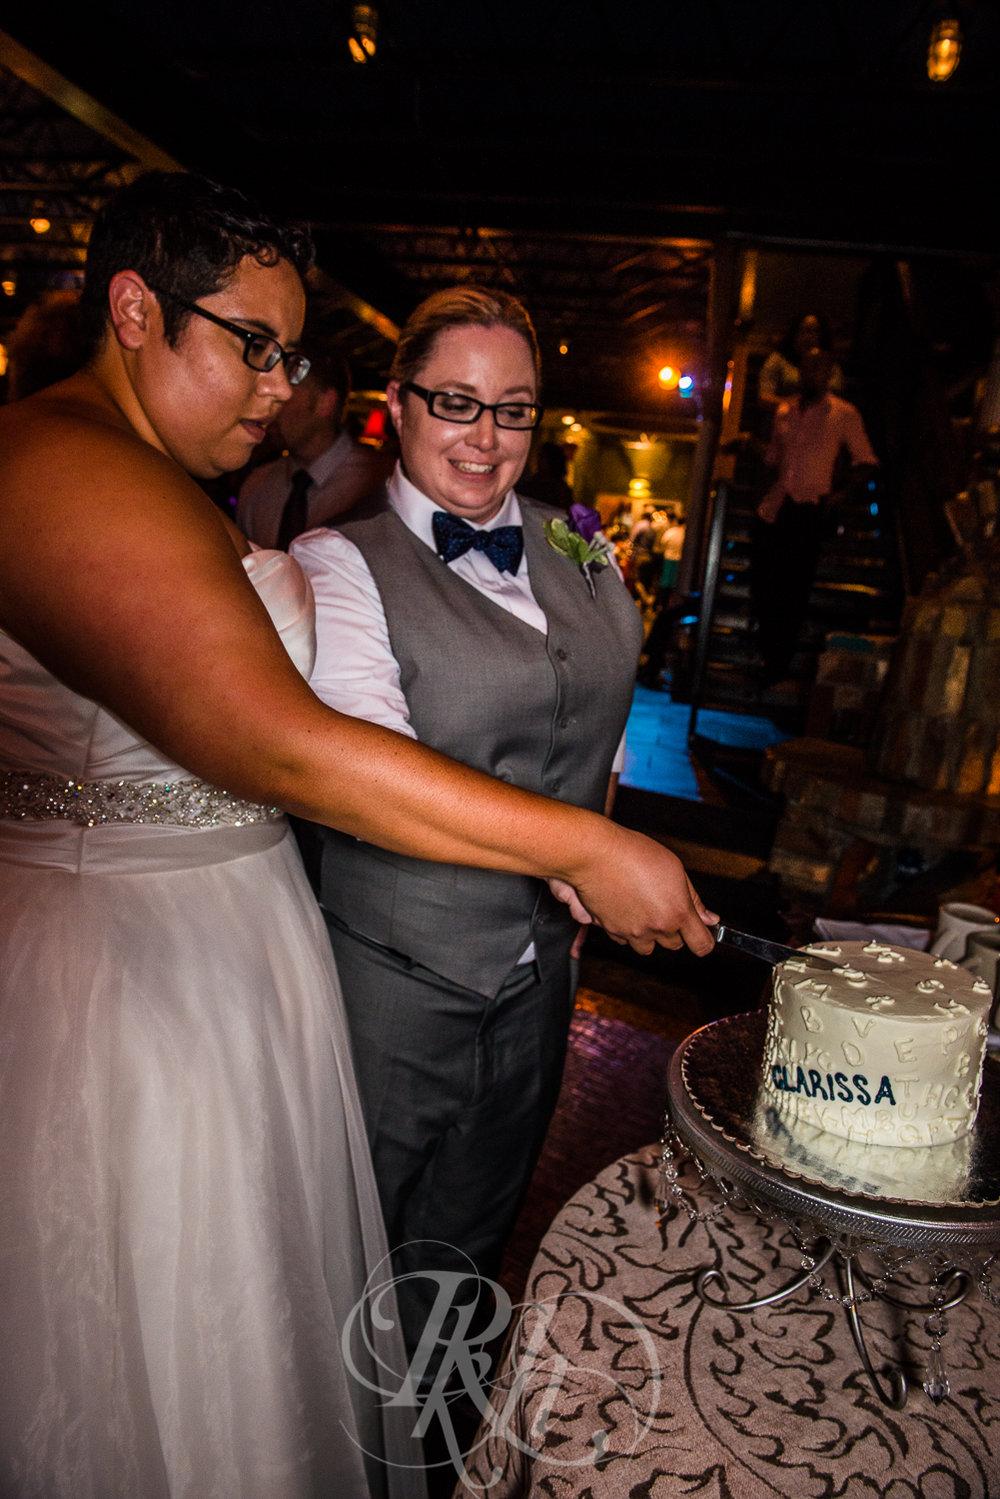 Beth & Clarissa - Minnesota LGBT Wedding Photography - RKH Images - Blog -59.jpg